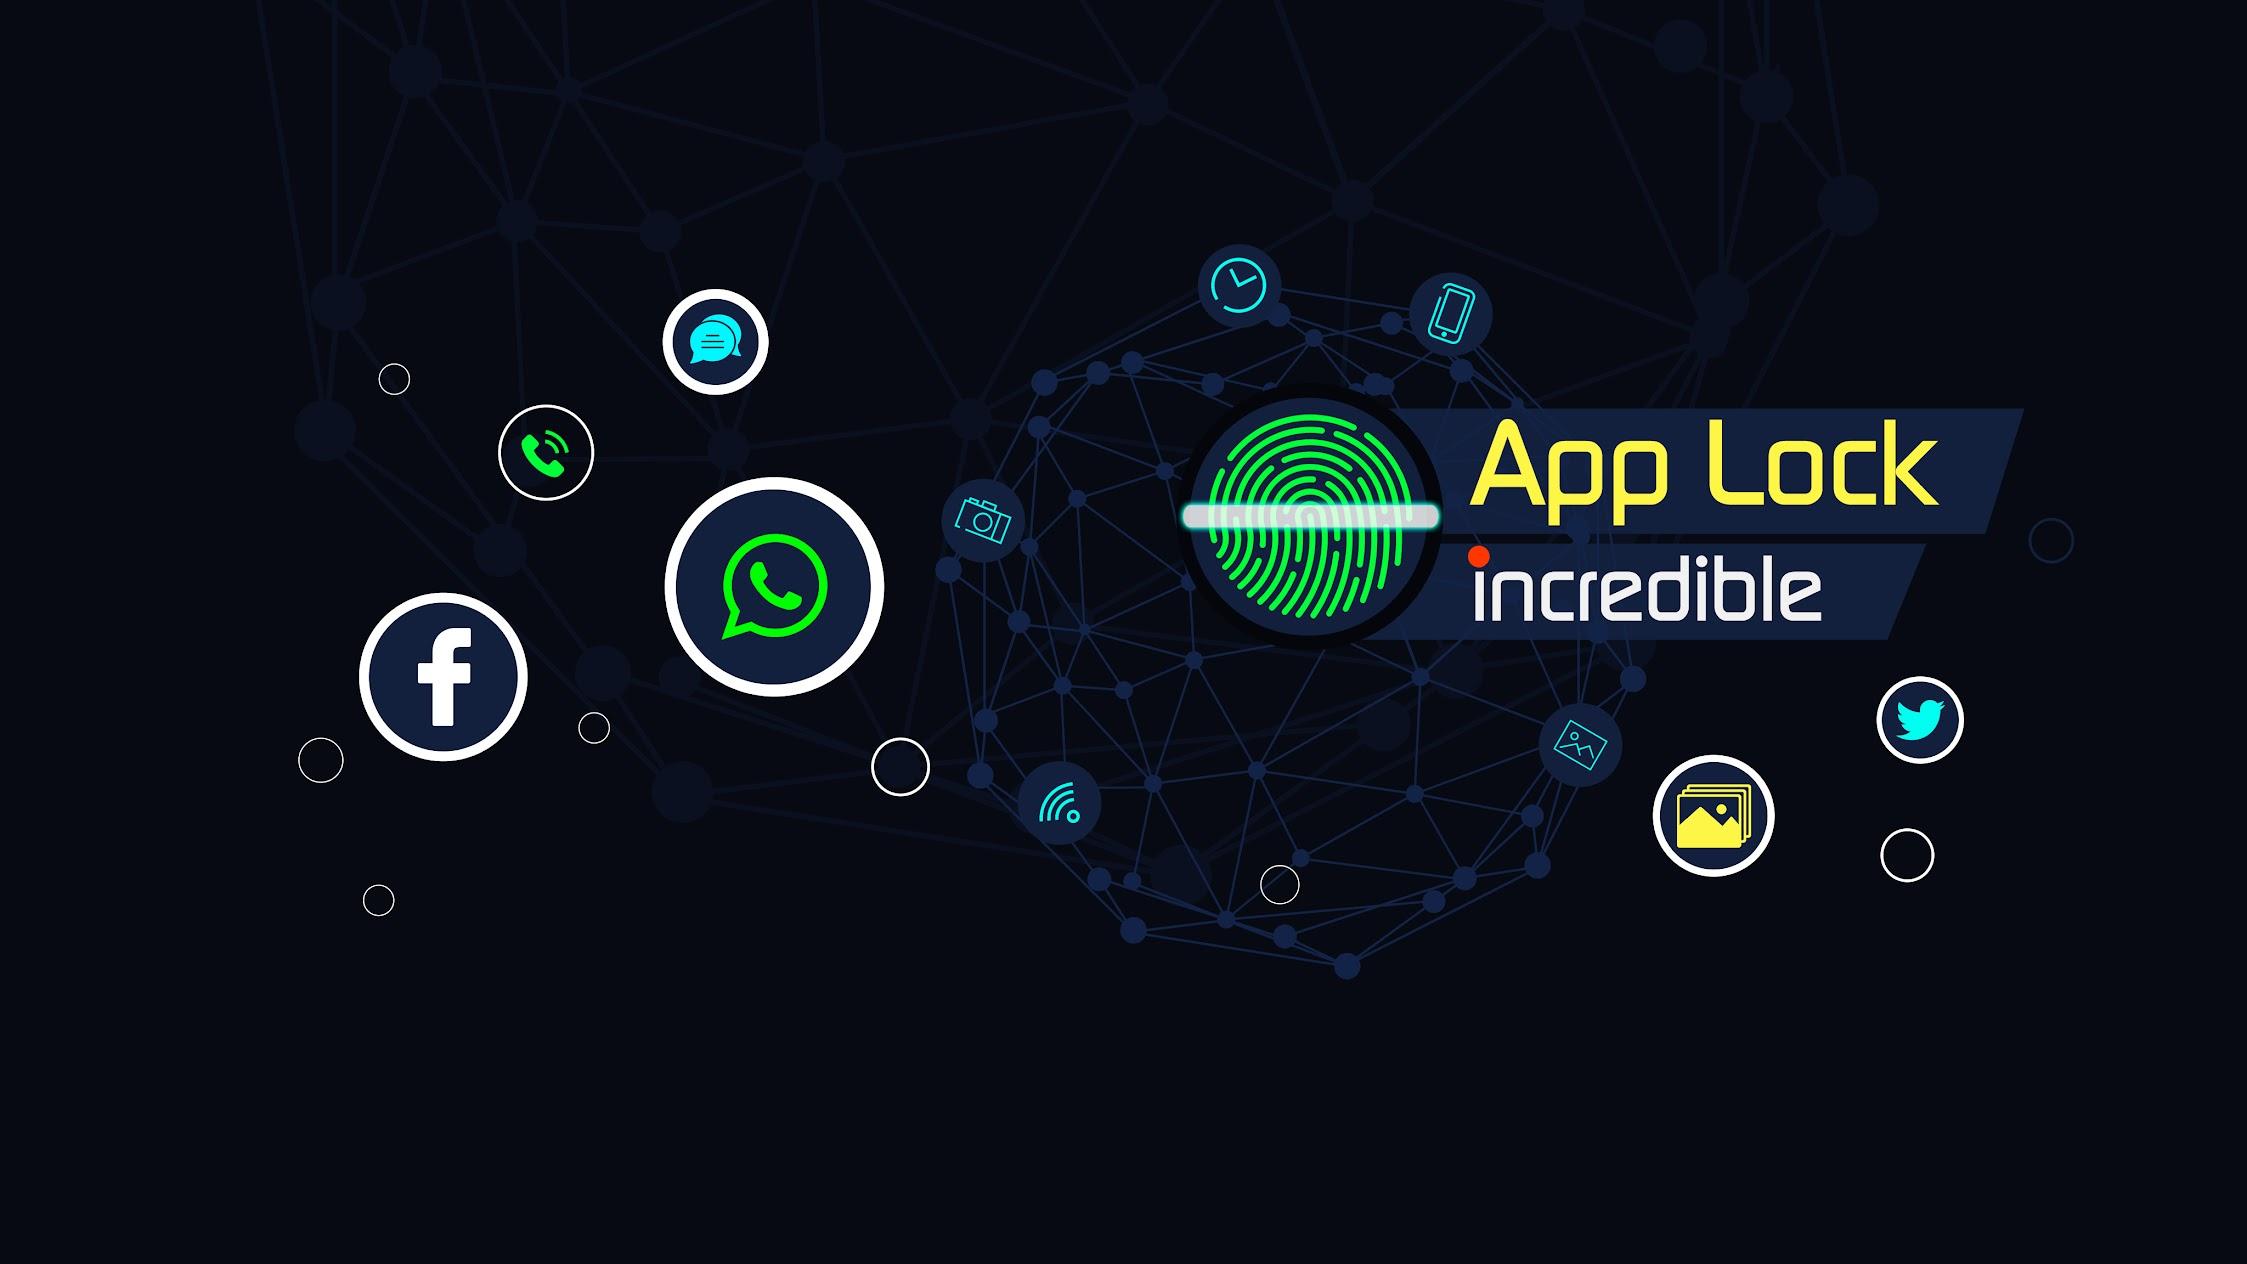 Incredible Apps Inc